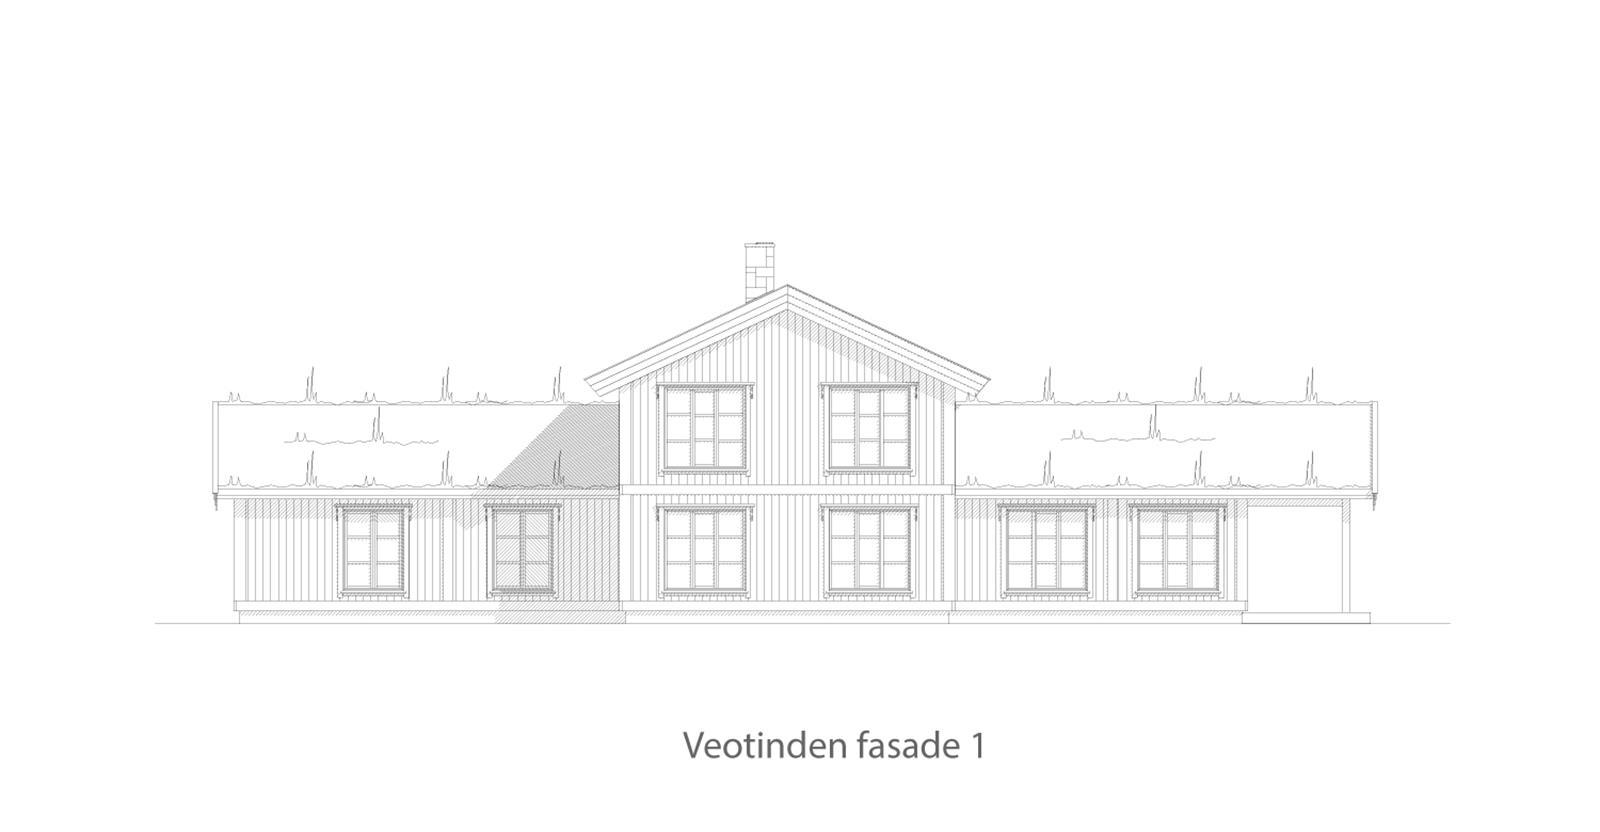 Veotinden fasade 1